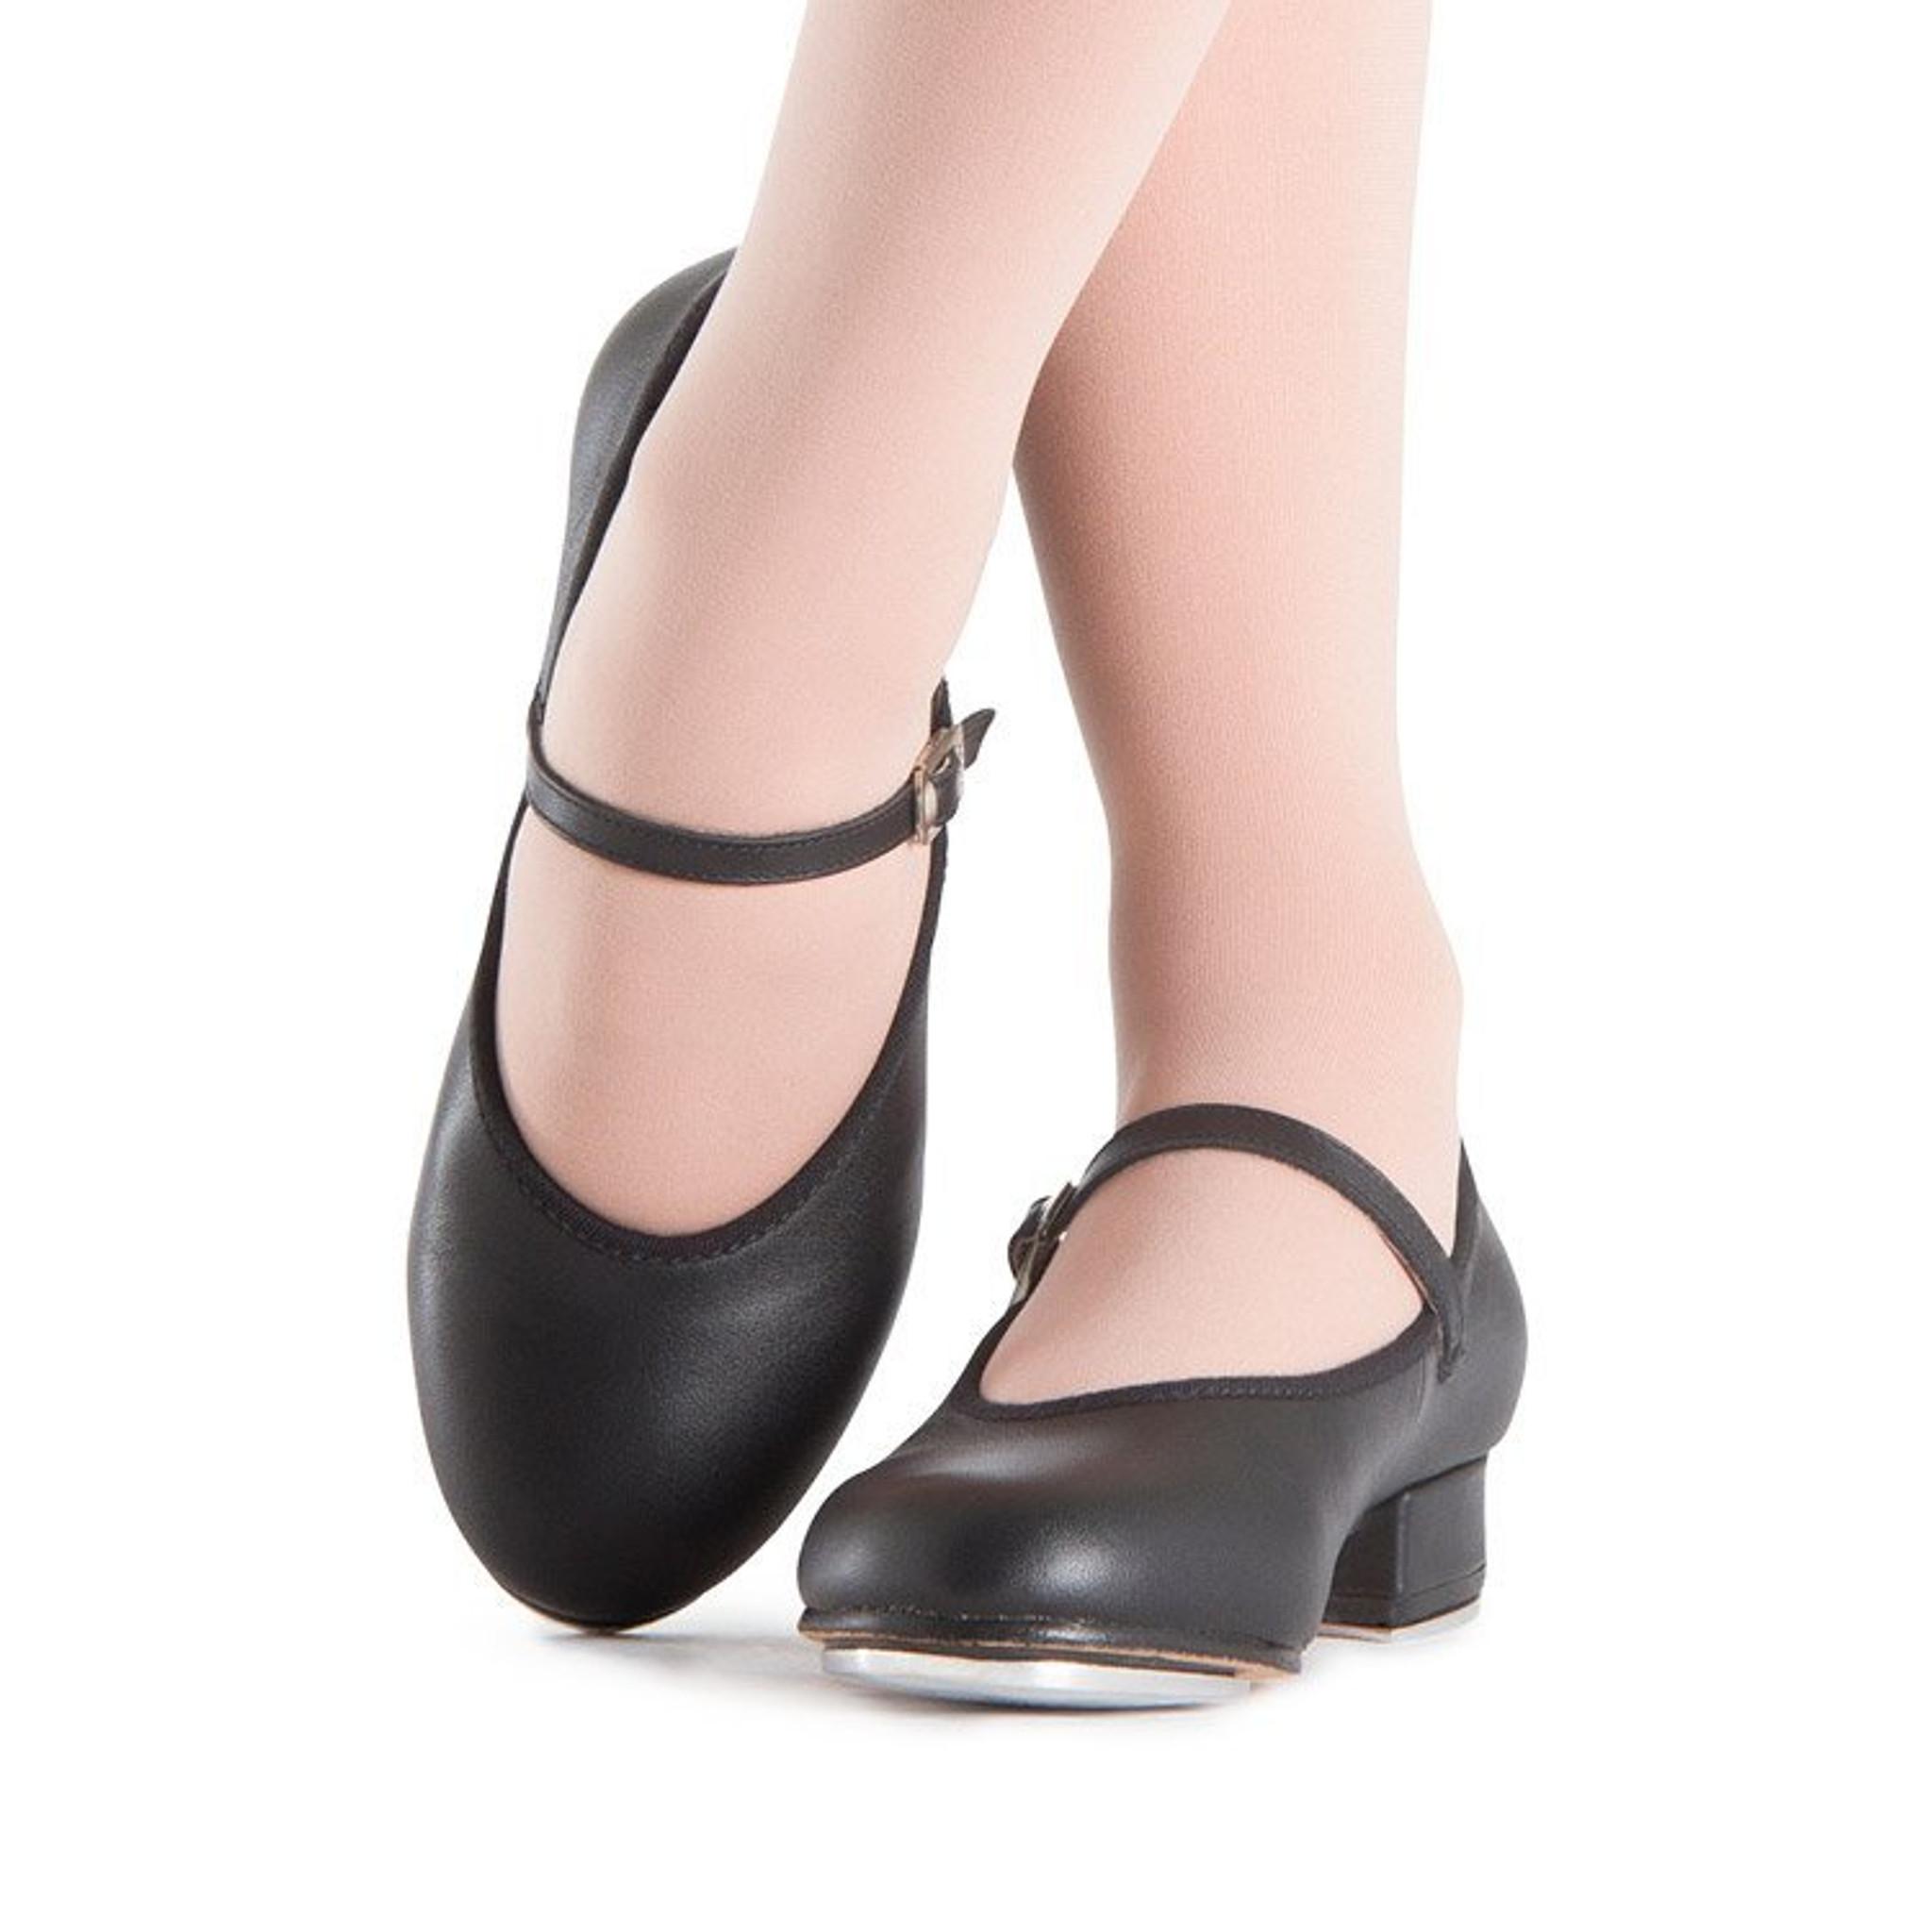 631993ec88b Bloch Tap On Girls Tap Shoes - DANCE DIRECT®